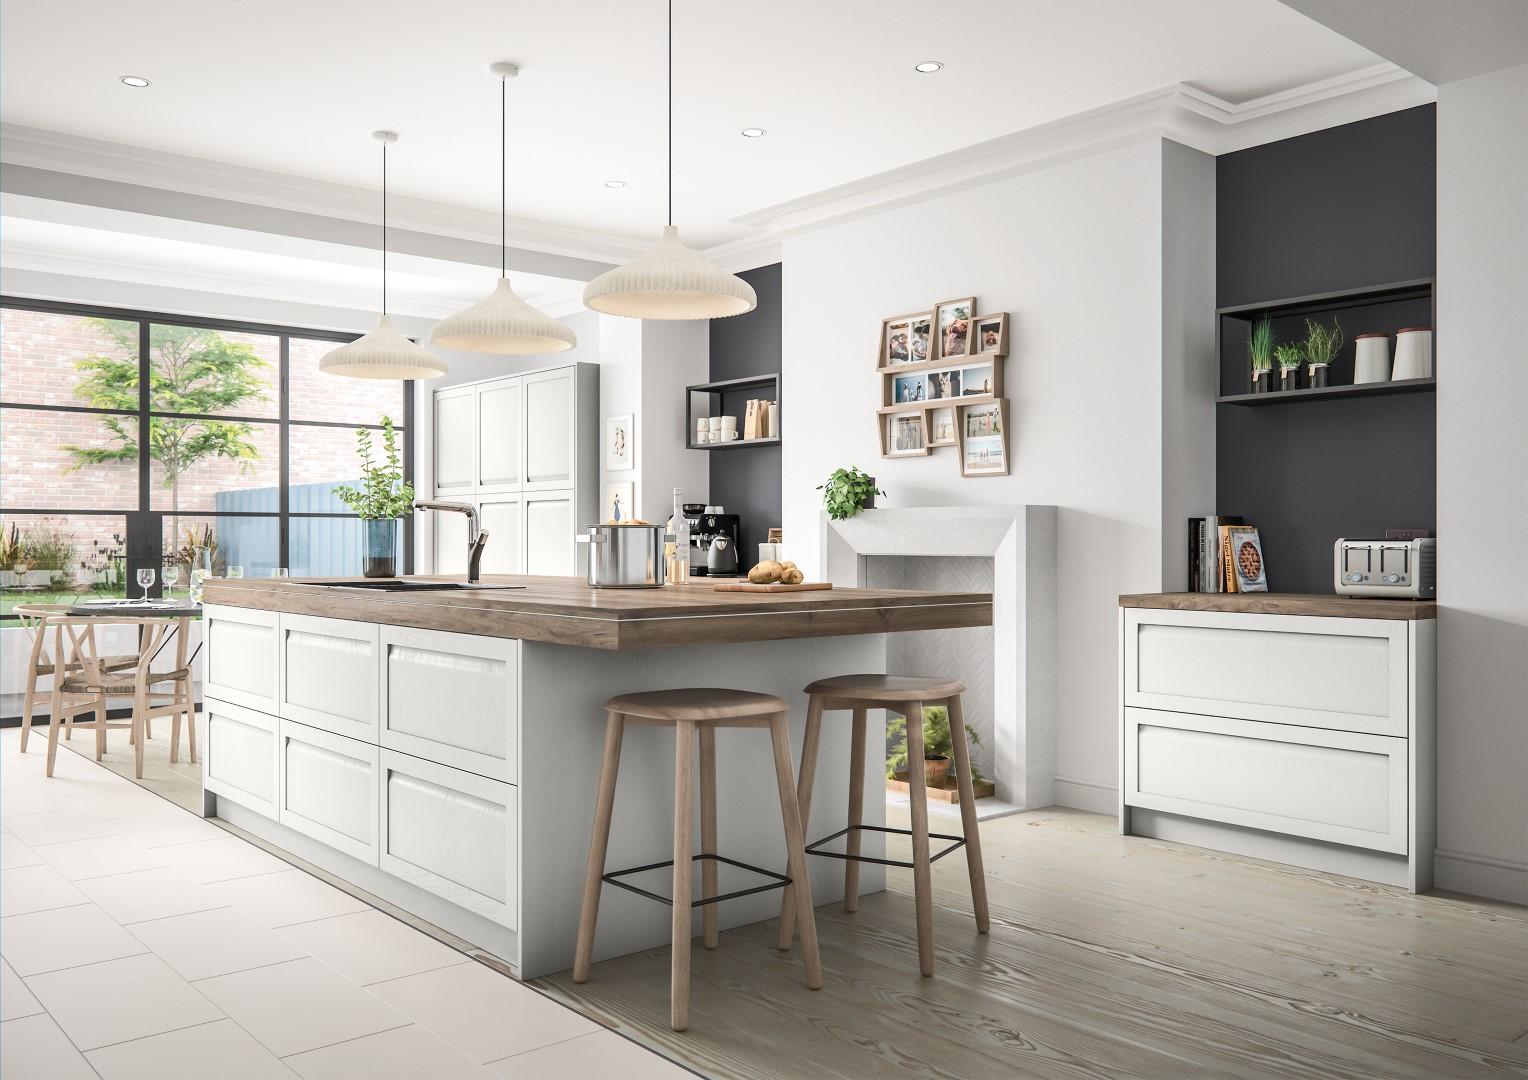 Harborne Light Grey - Kitchen Design - Alan Kelly Kitchens - Waterford - 2